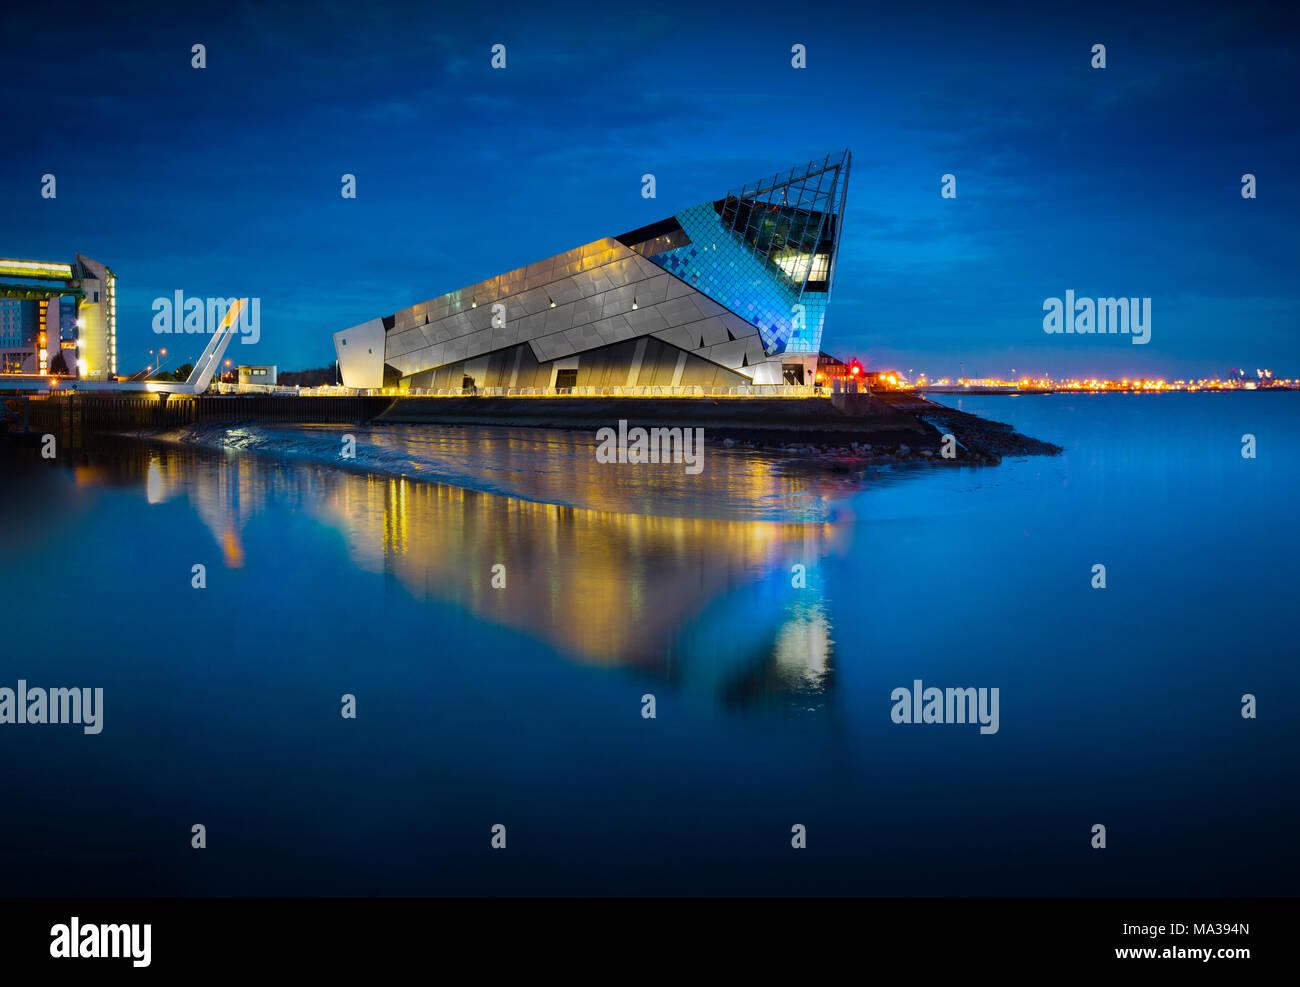 L'Aquarium Deep, Hull, East Yorkshire, UK - 28 mars 2018 Photo Stock